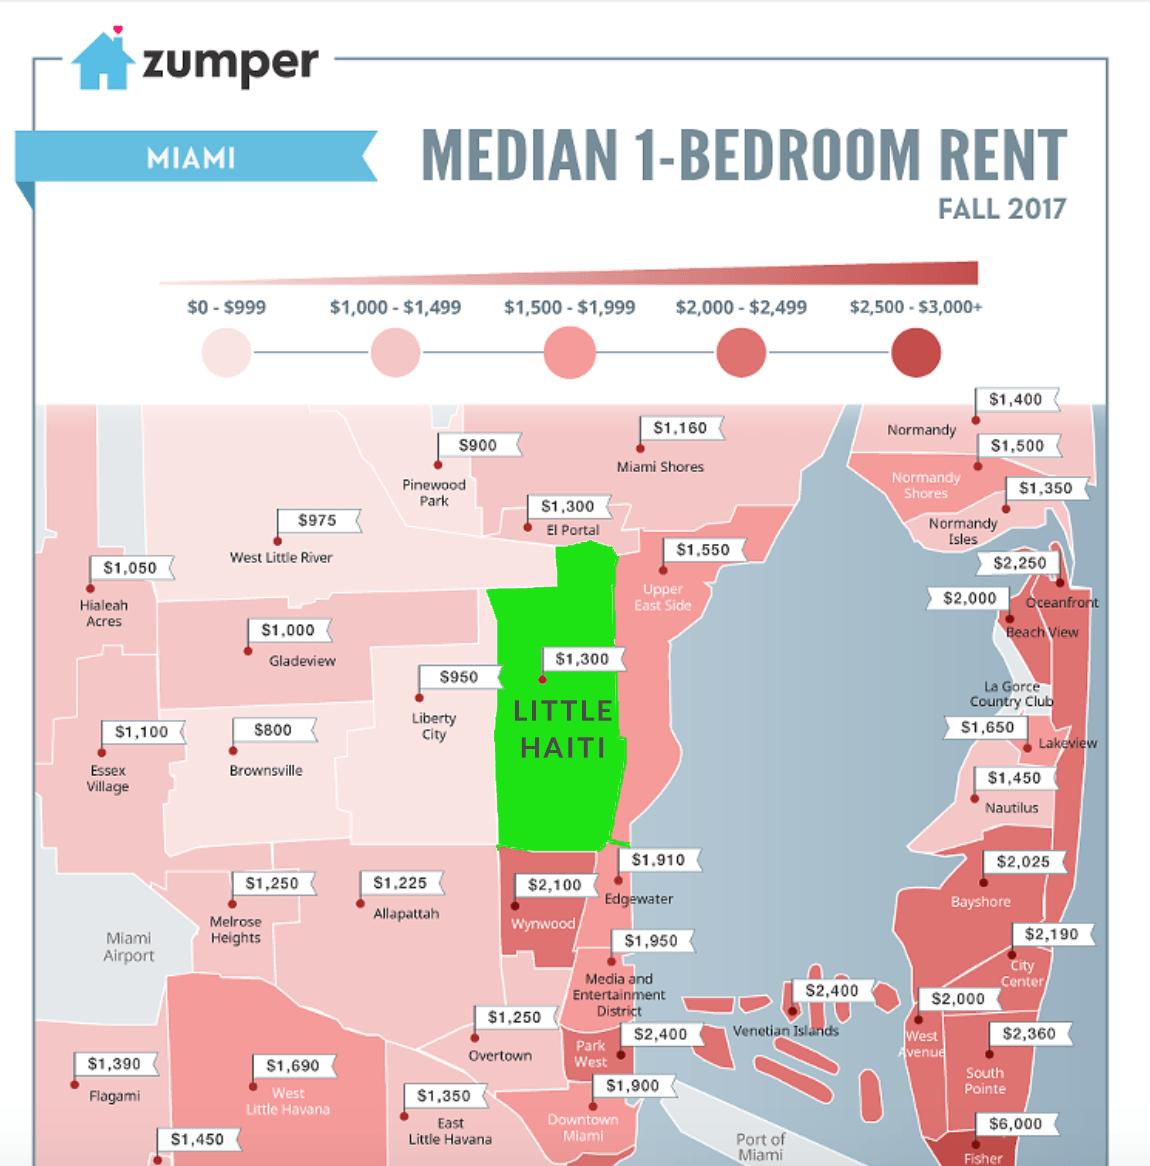 micro units coming to the miami real estate market